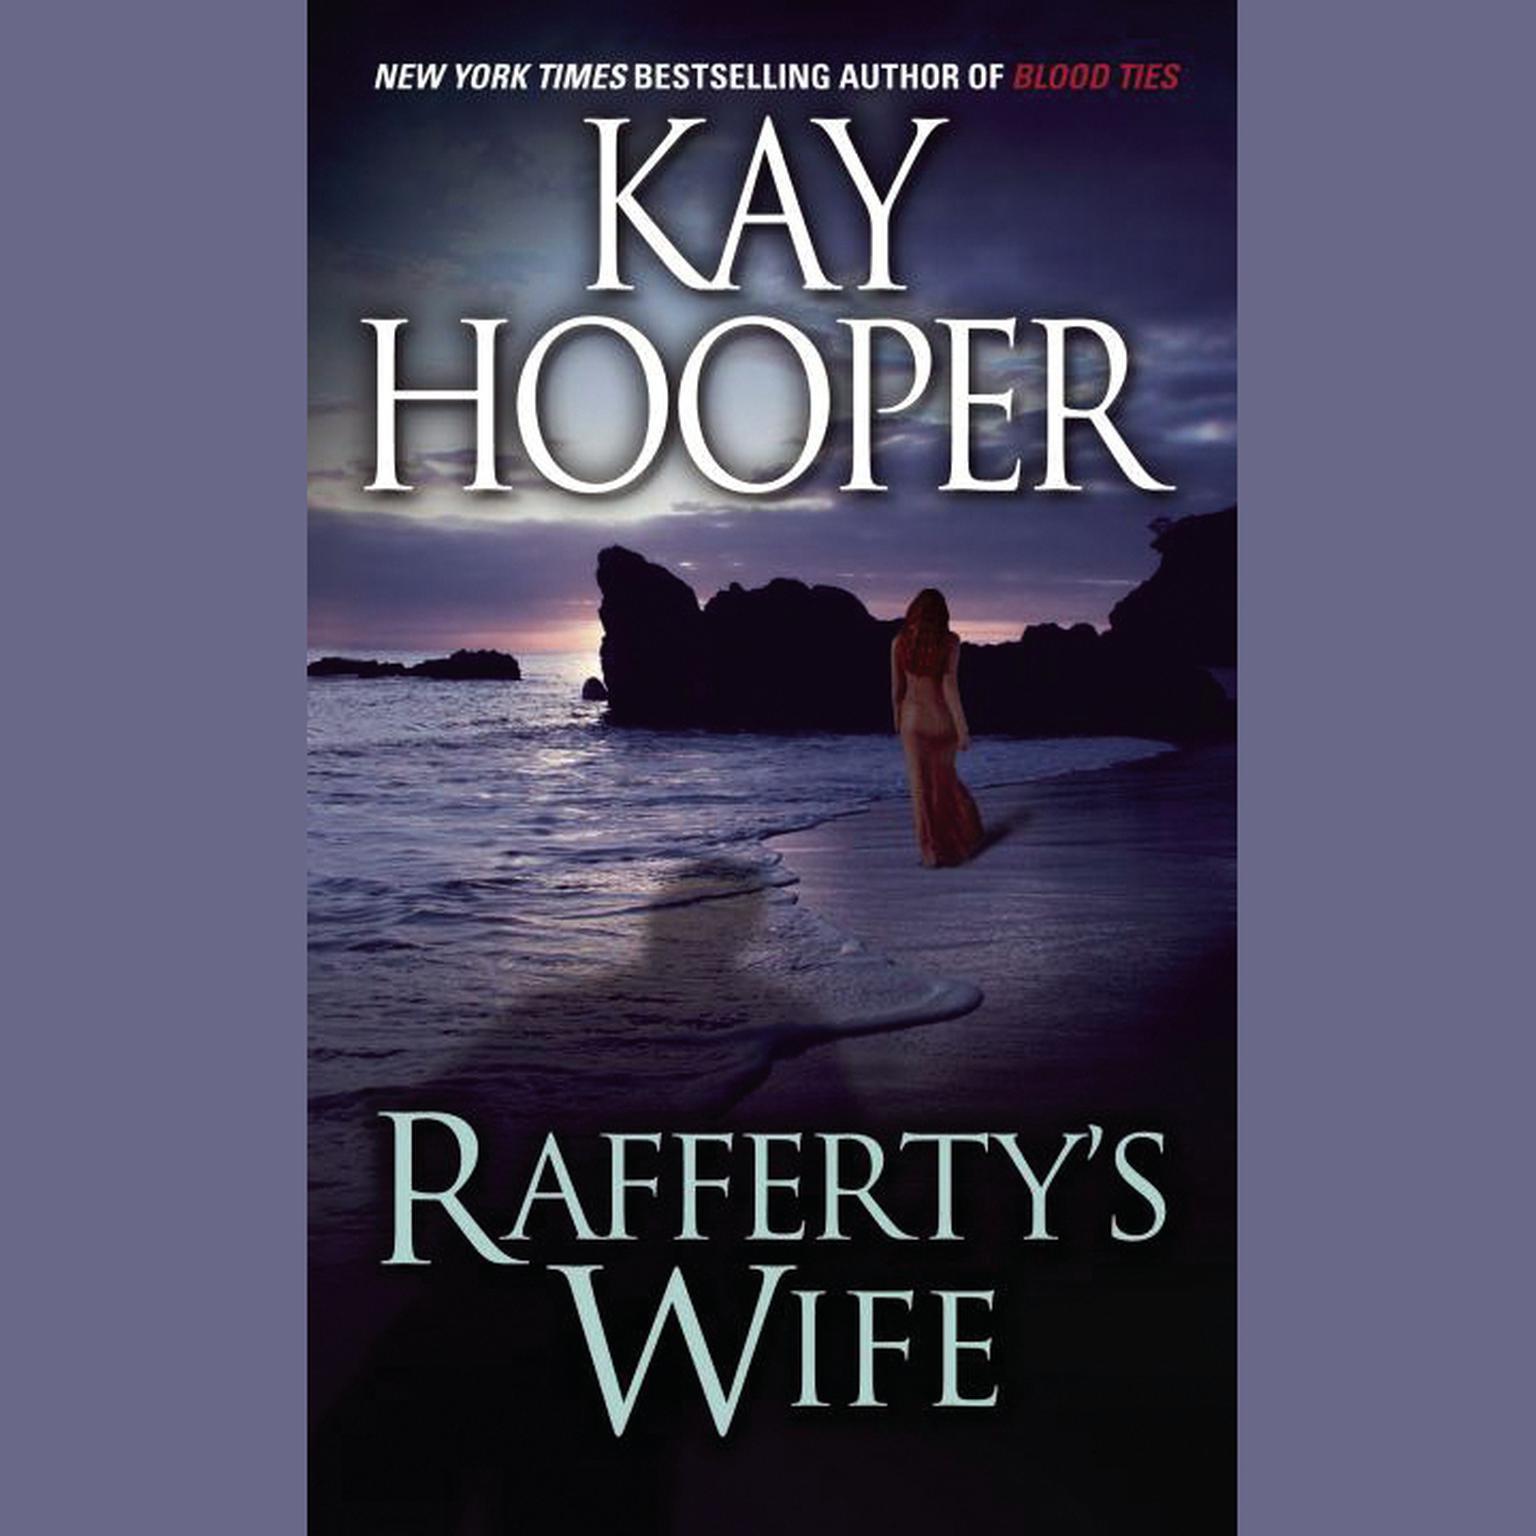 Printable Rafferty's Wife Audiobook Cover Art